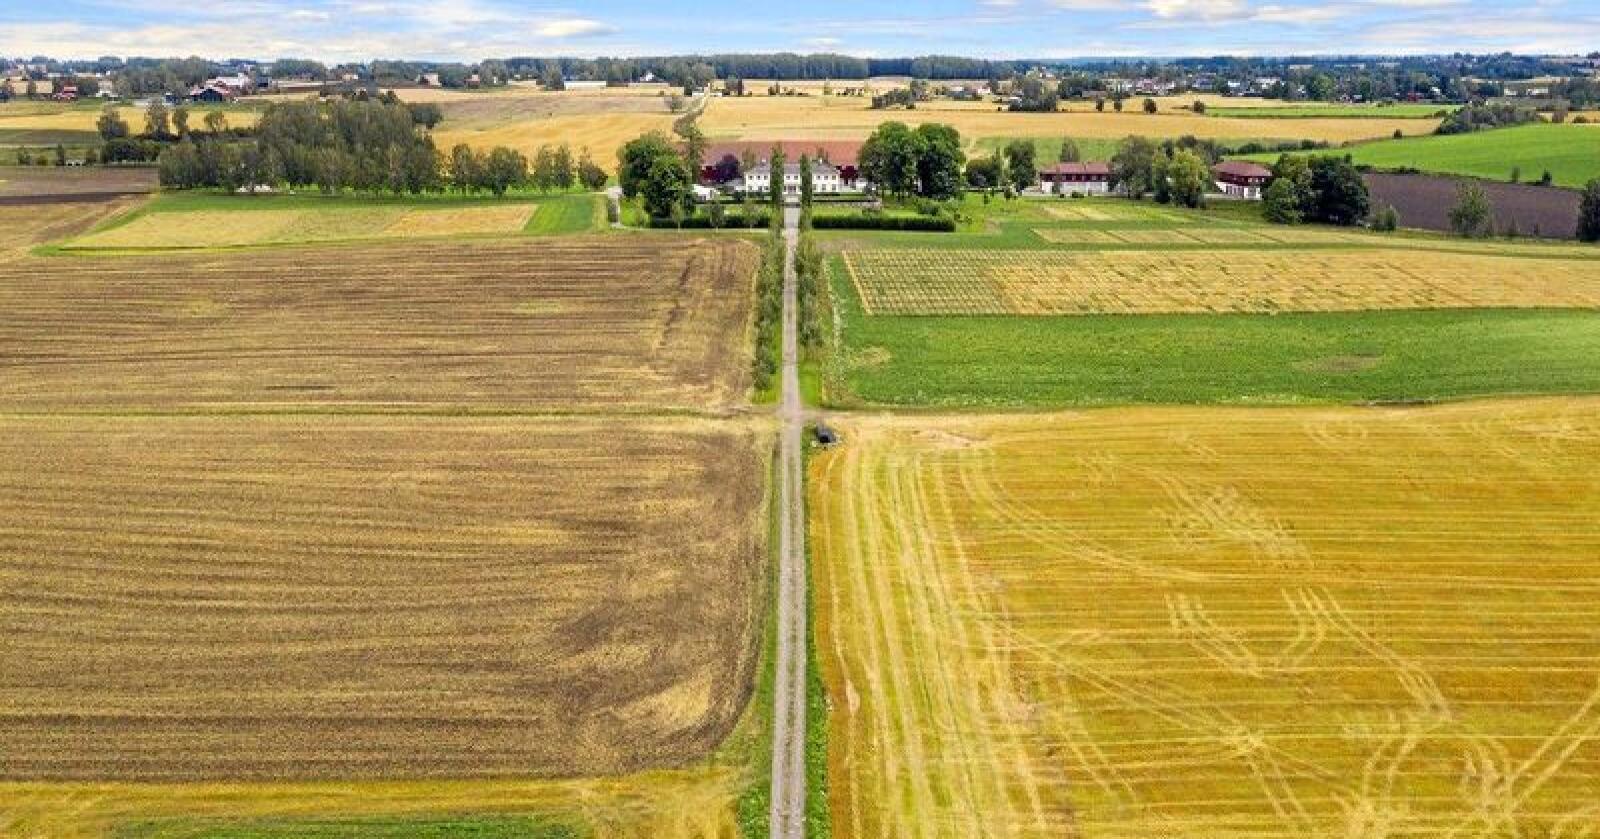 Staur Gård i Stange har store områder med dyrket mark. Foto: Tegneby & Grønnerød Landbruksmegling